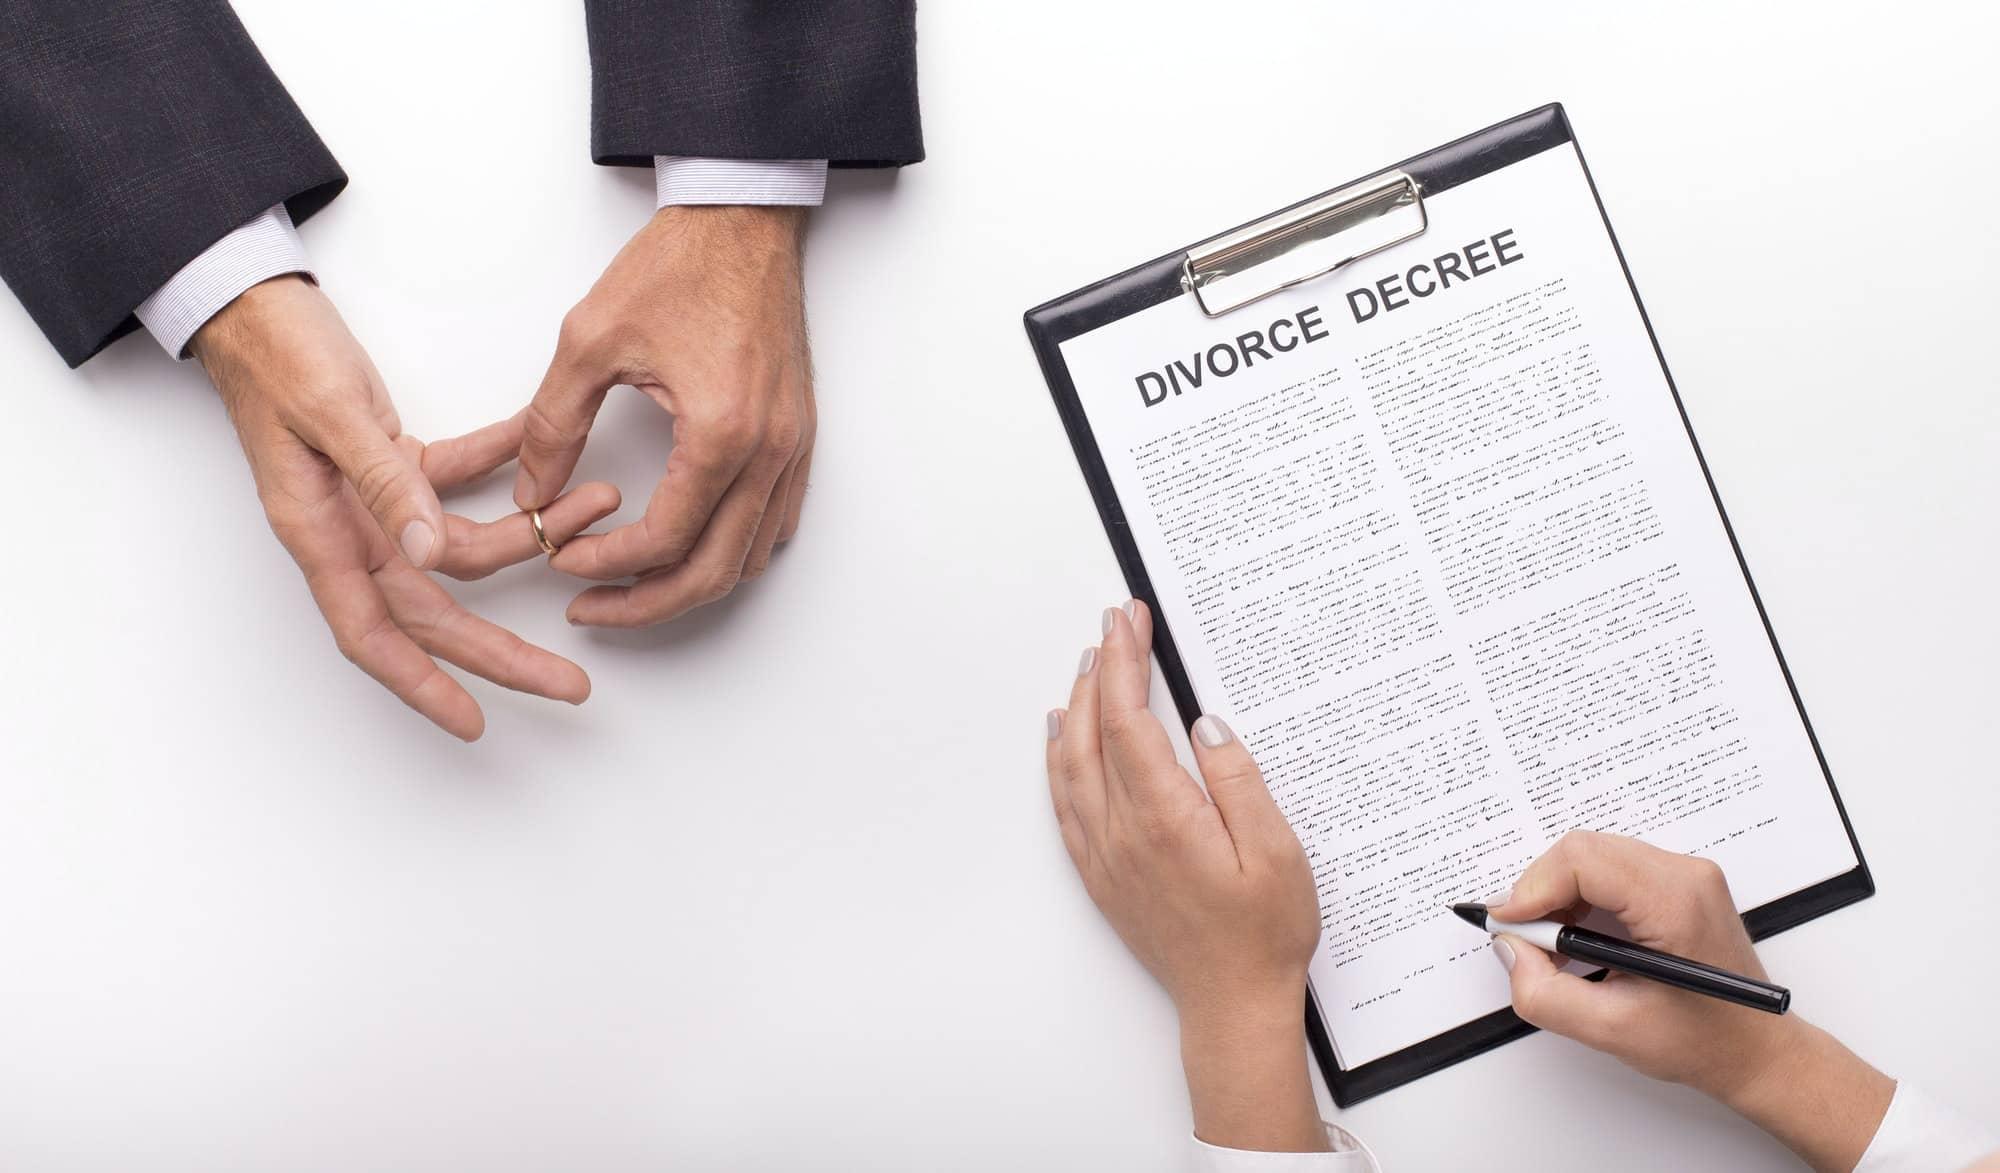 Lawyer draw up divorce decree on planner